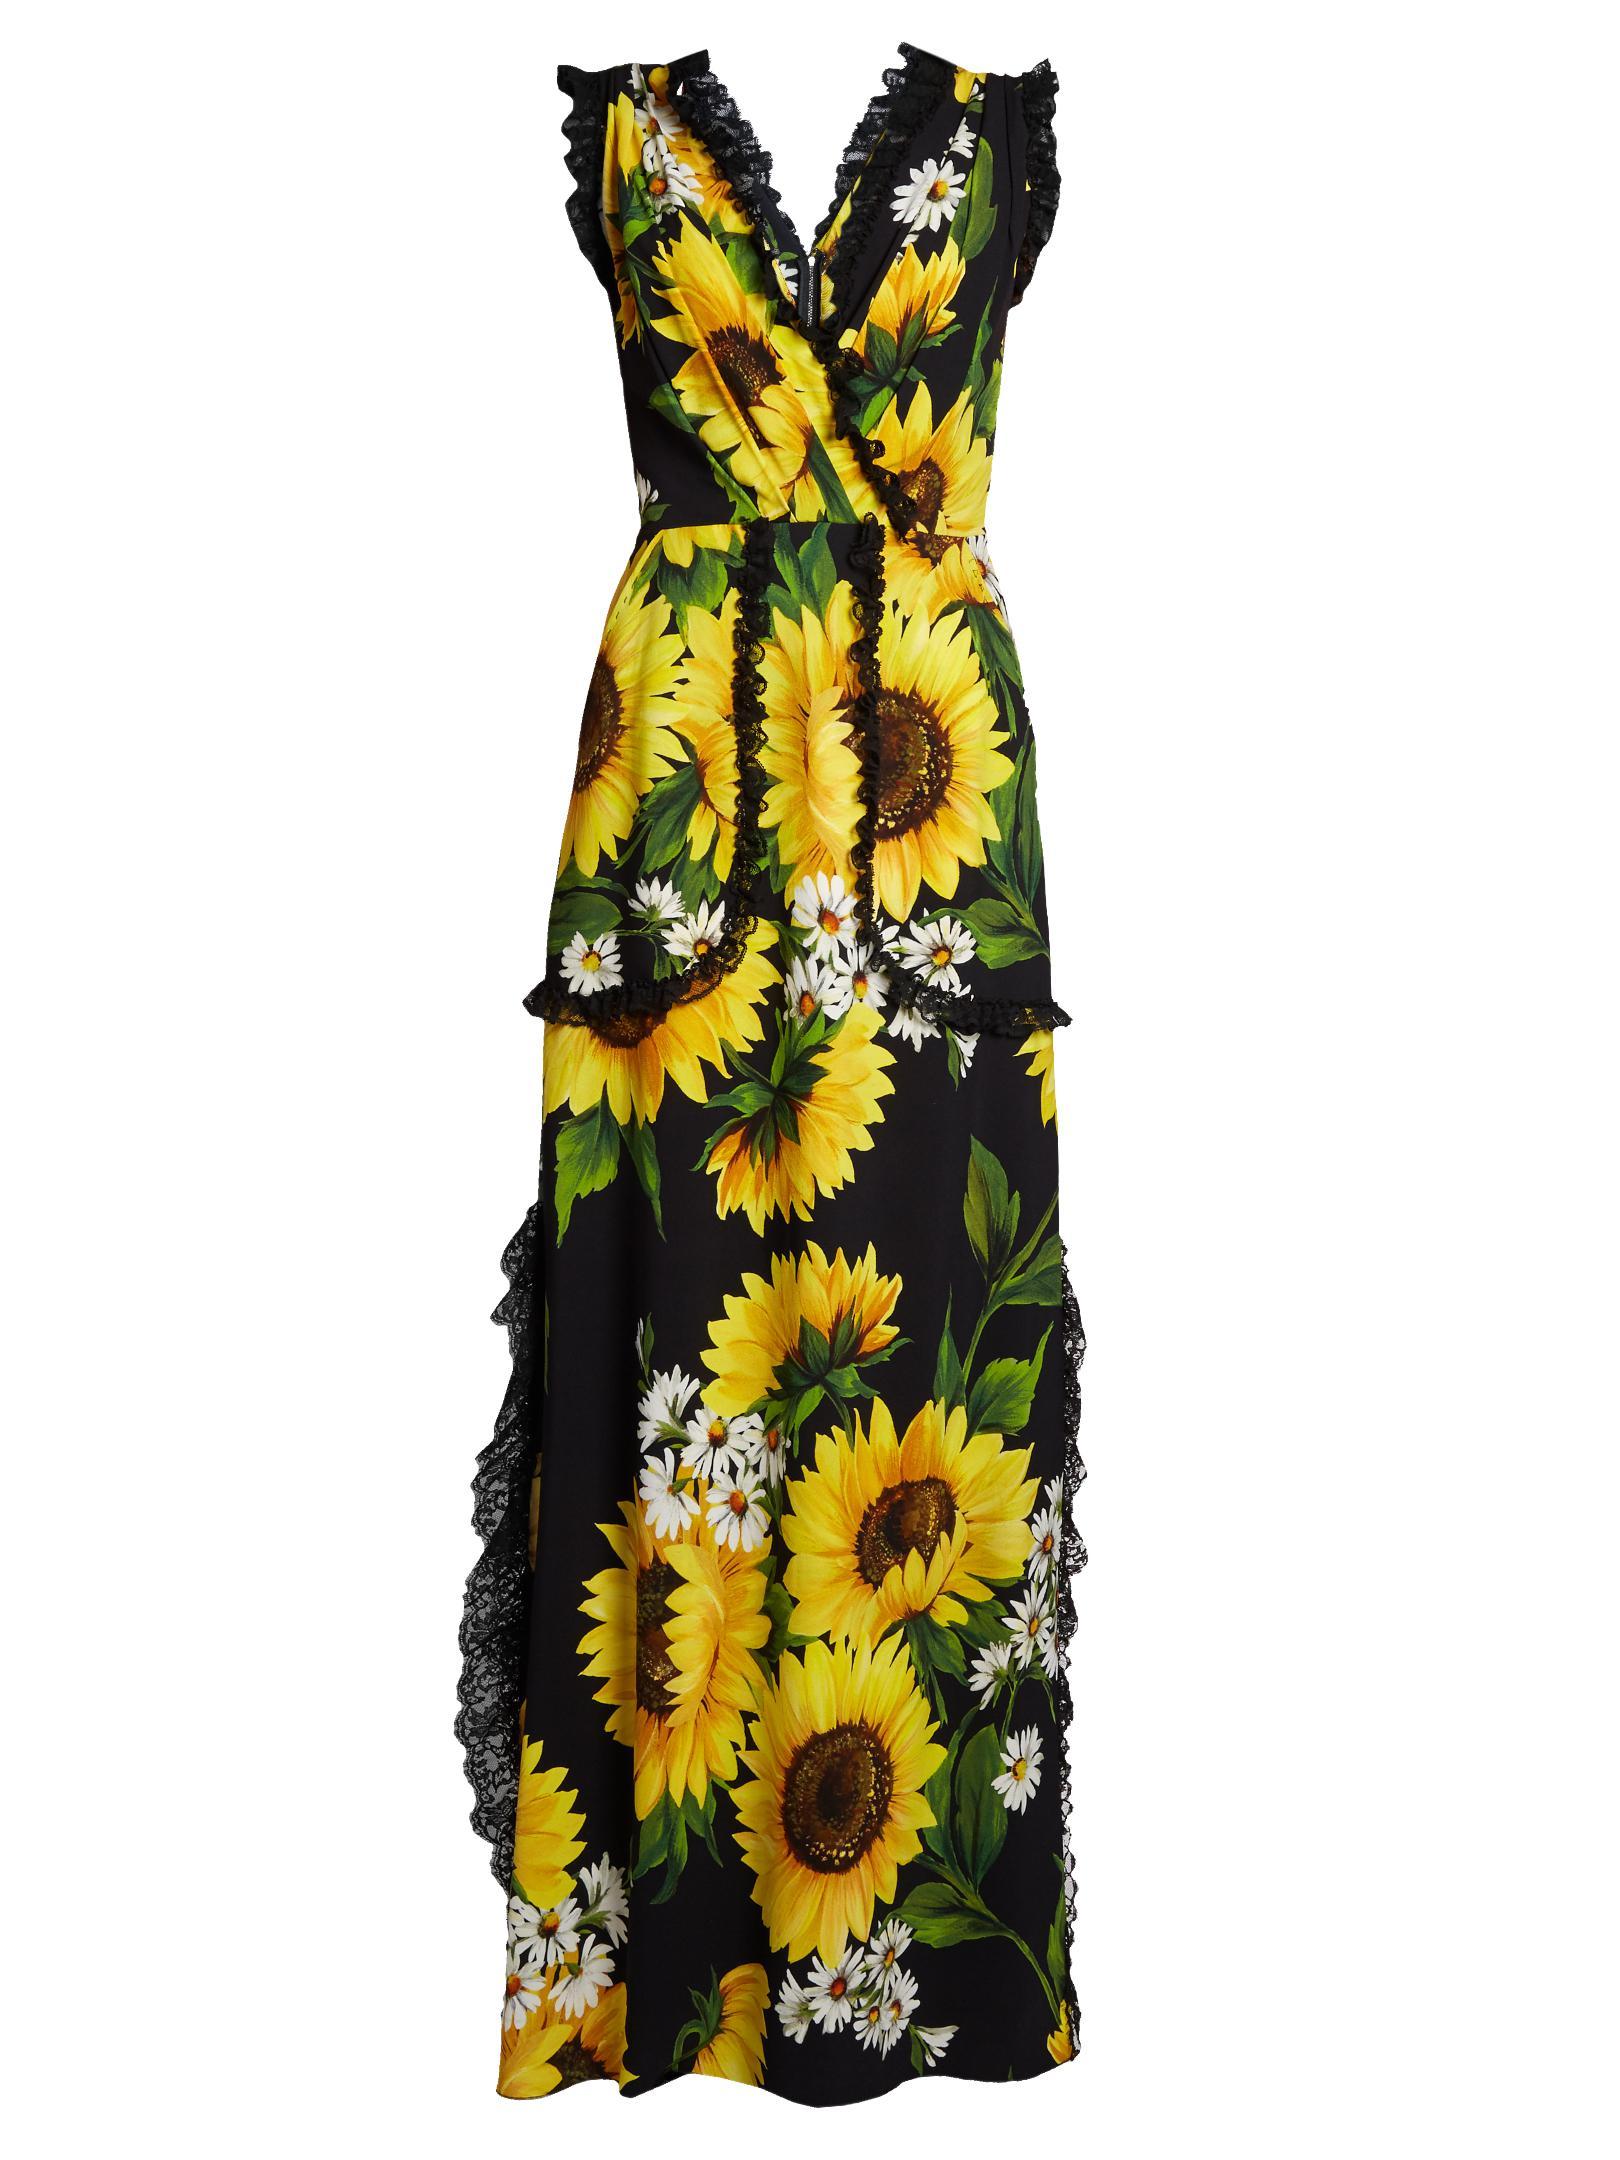 cc200a1956102 Dolce & Gabbana Sunflower-print Cady Gown - Lyst